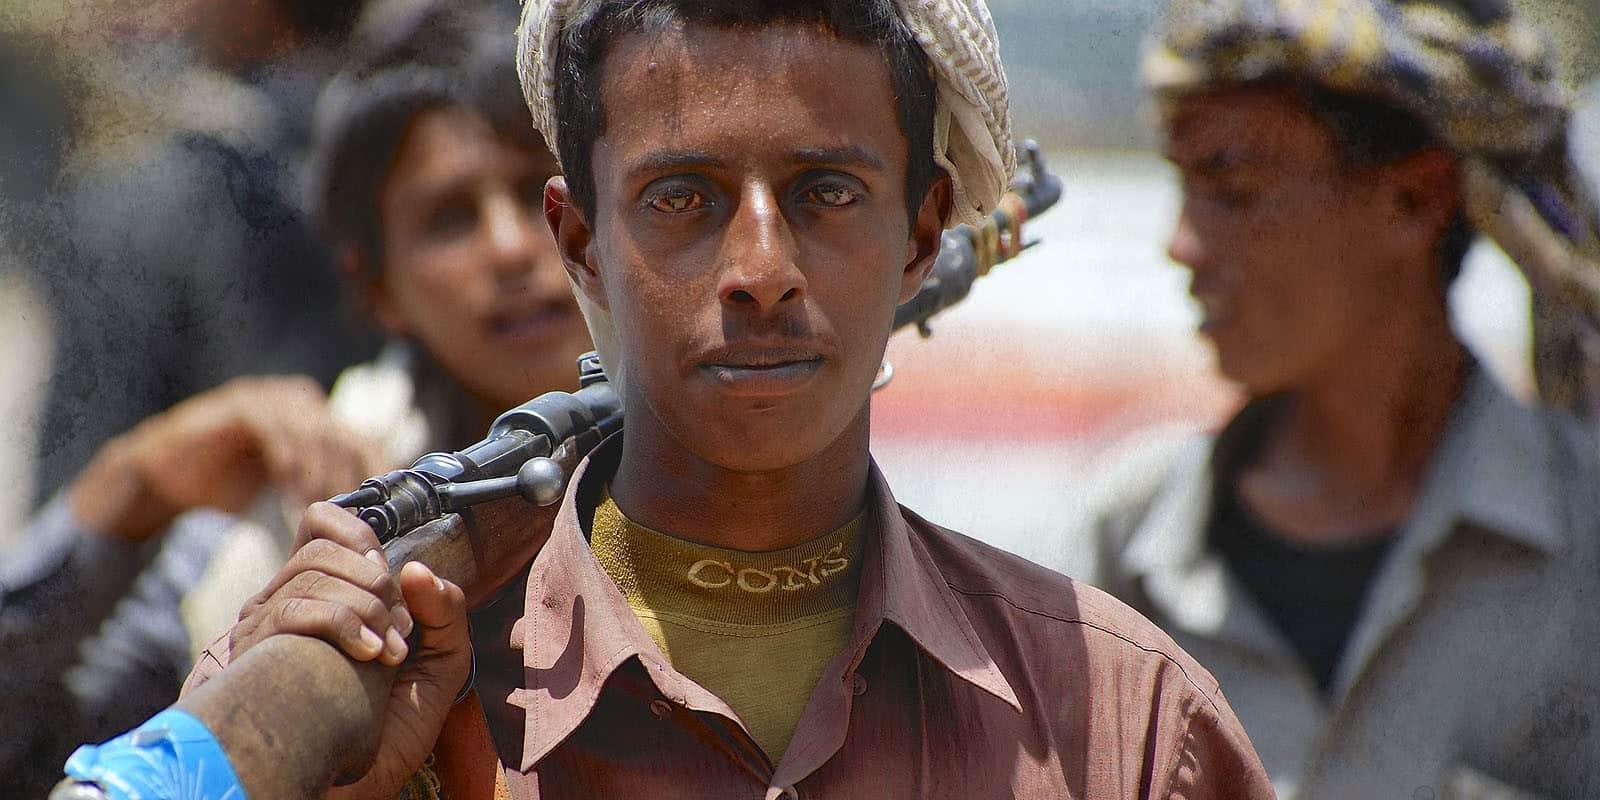 Unidentified young Yemeni man holds a rifle in Aden, Yemen.